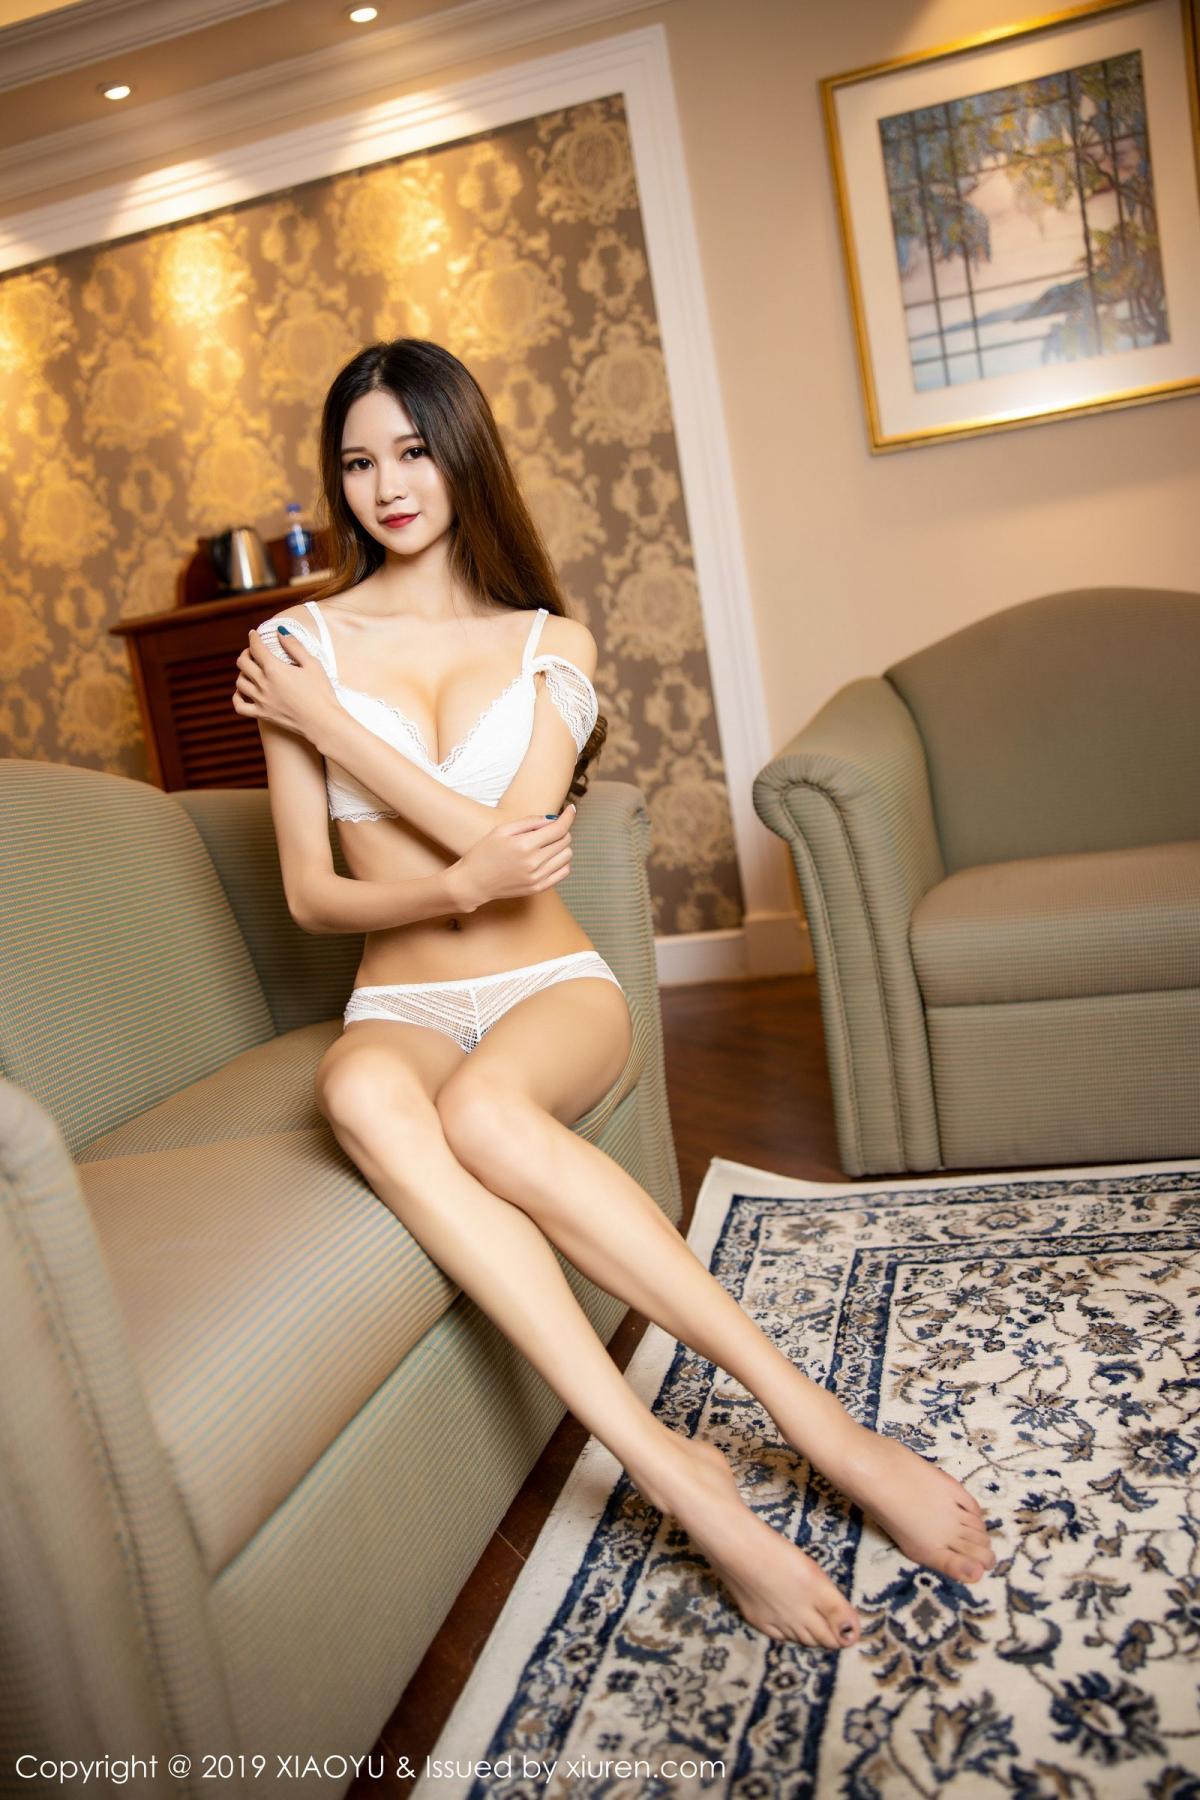 [XiaoYu] Vol.218 Cheng Cheng Cheng 44P, Cheng Cheng Cheng, Nurse, Tall, XiaoYu